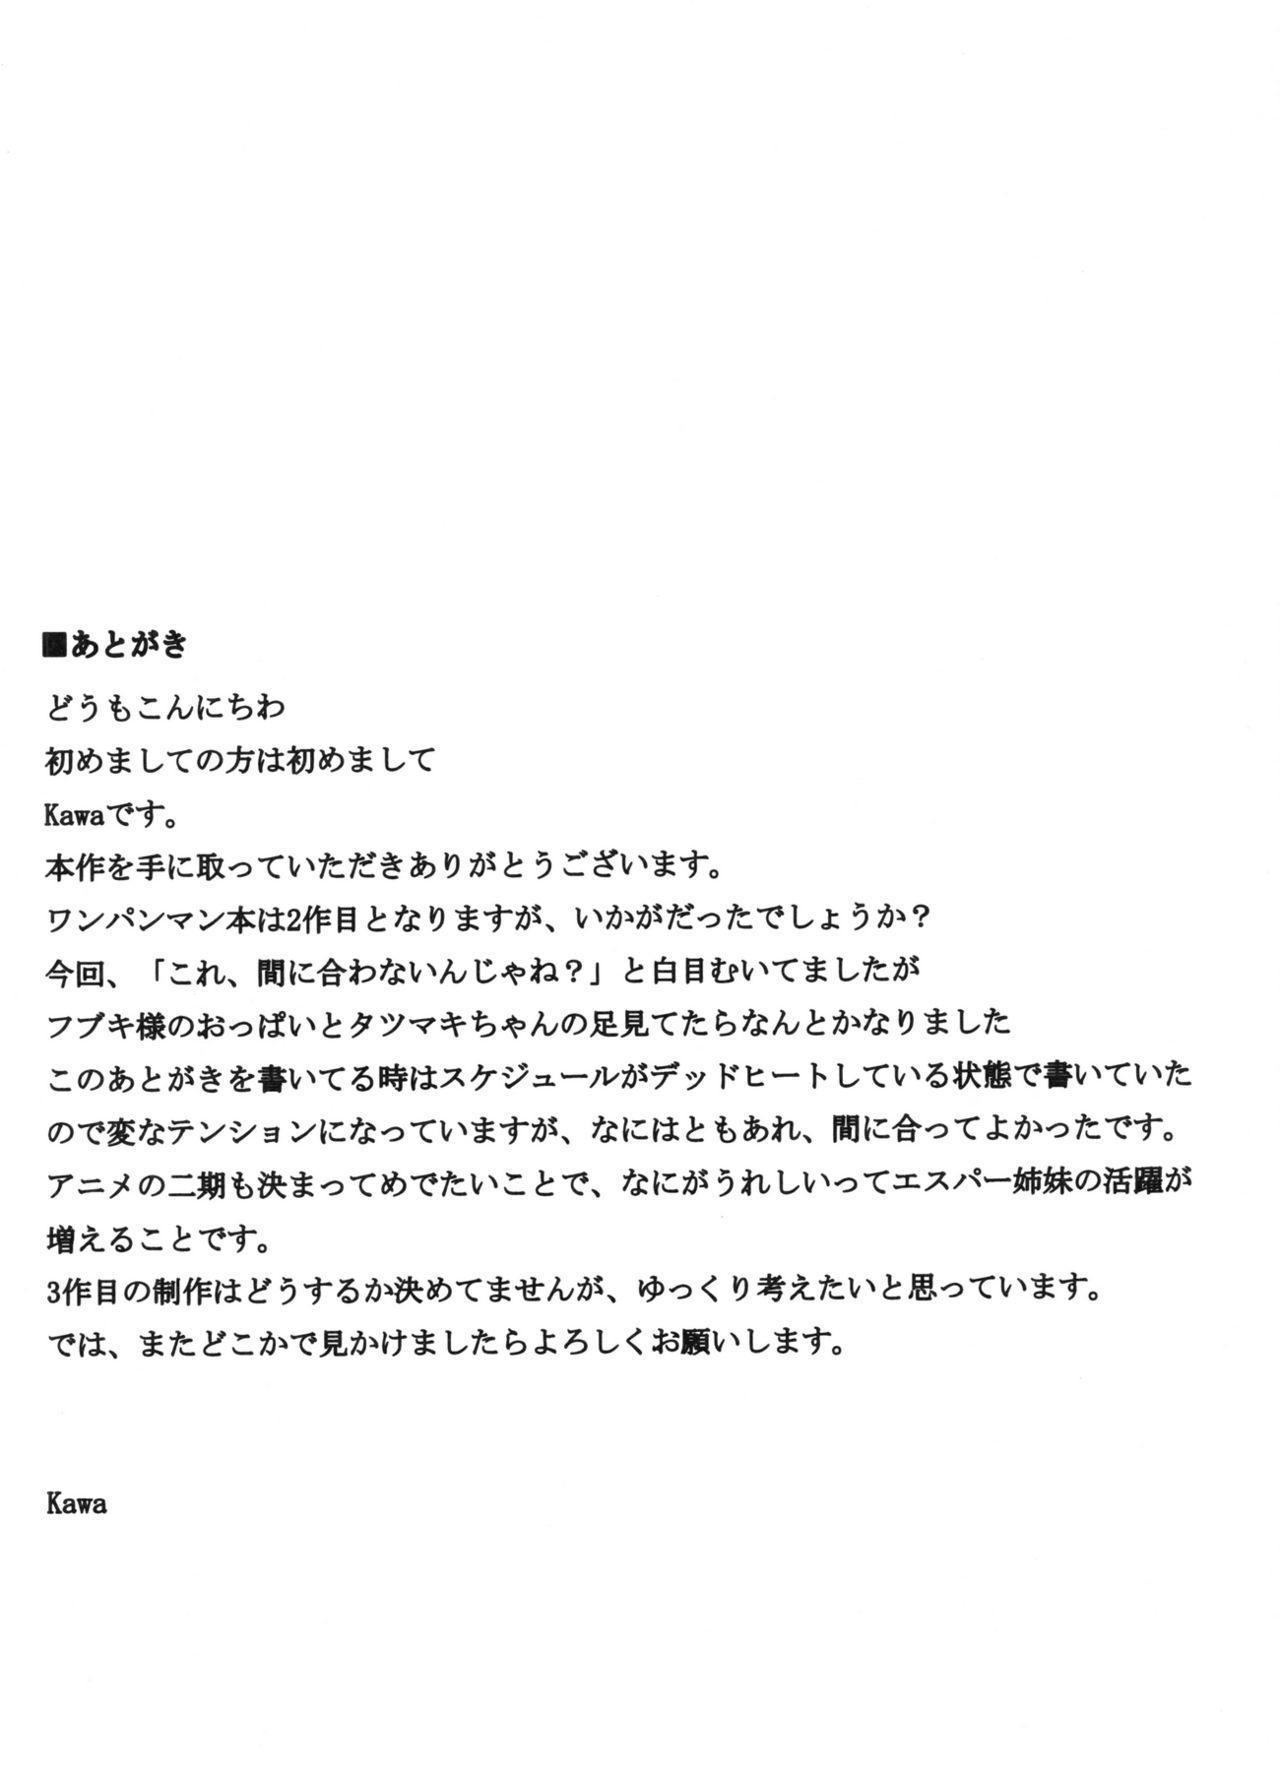 Dekoboko Love Sister 2-gekime! 23